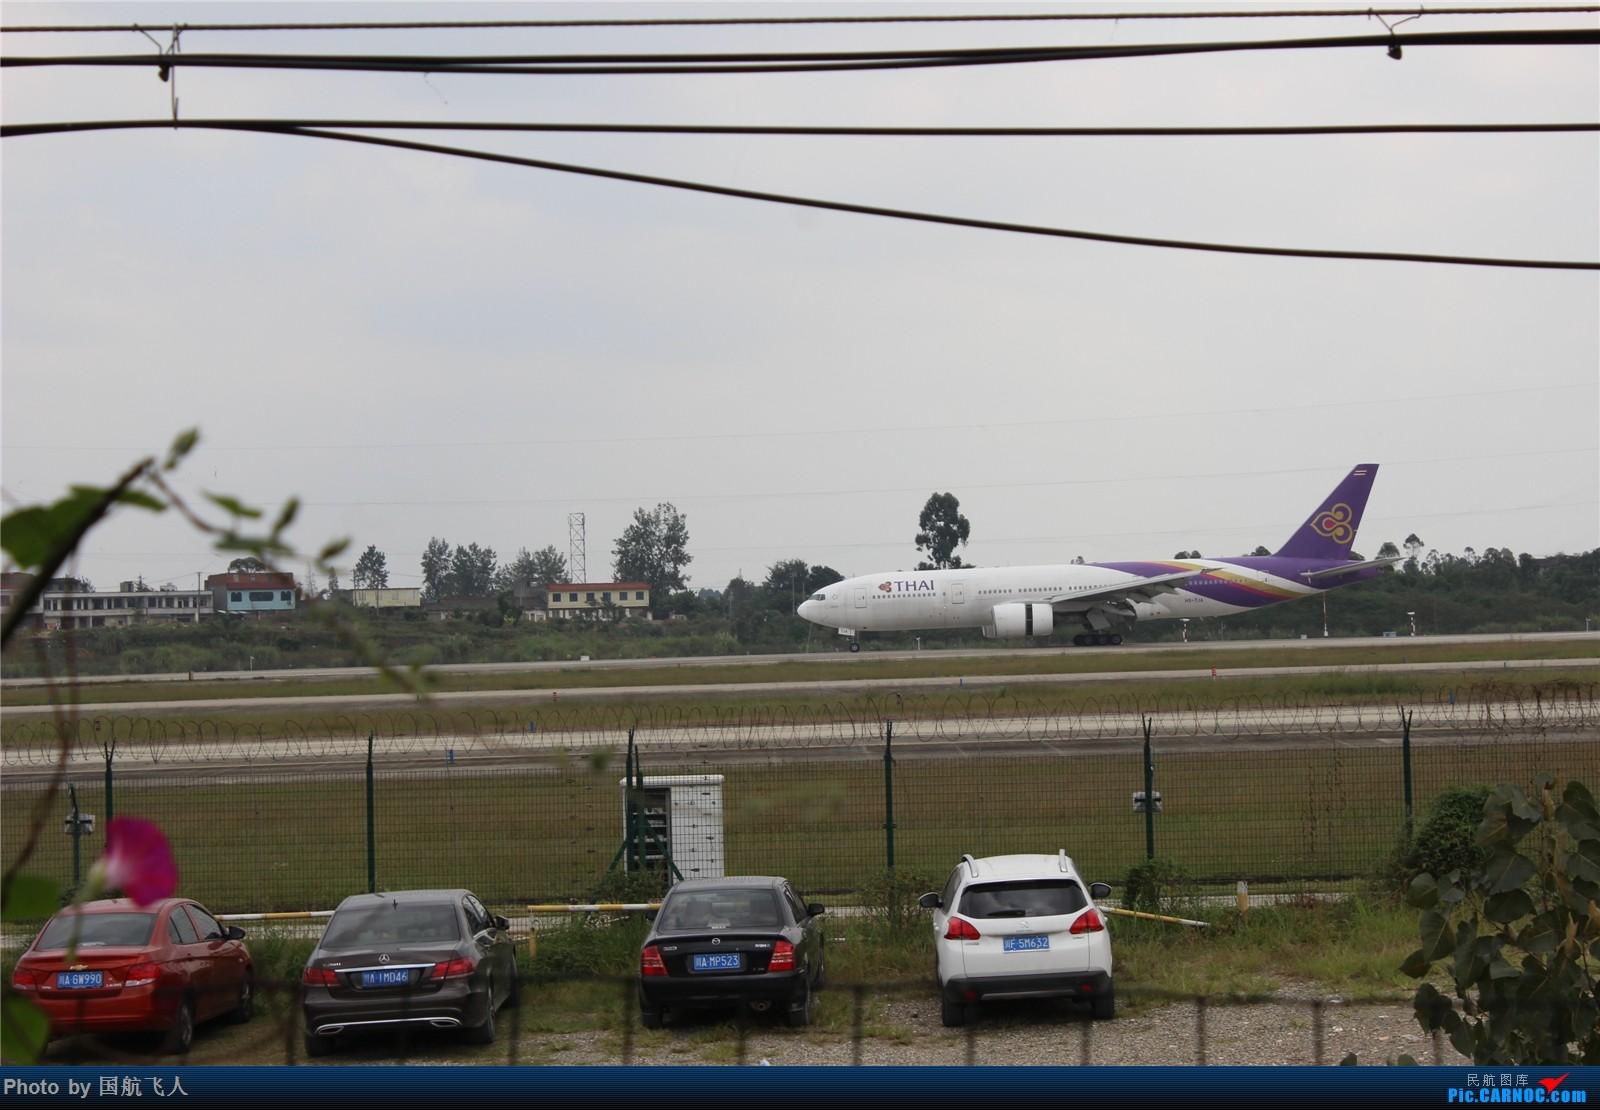 Re:[原创]专辑【2】:10月4日拍的重型机 BOEING 777-200LR HS-TJA 中国重庆江北国际机场